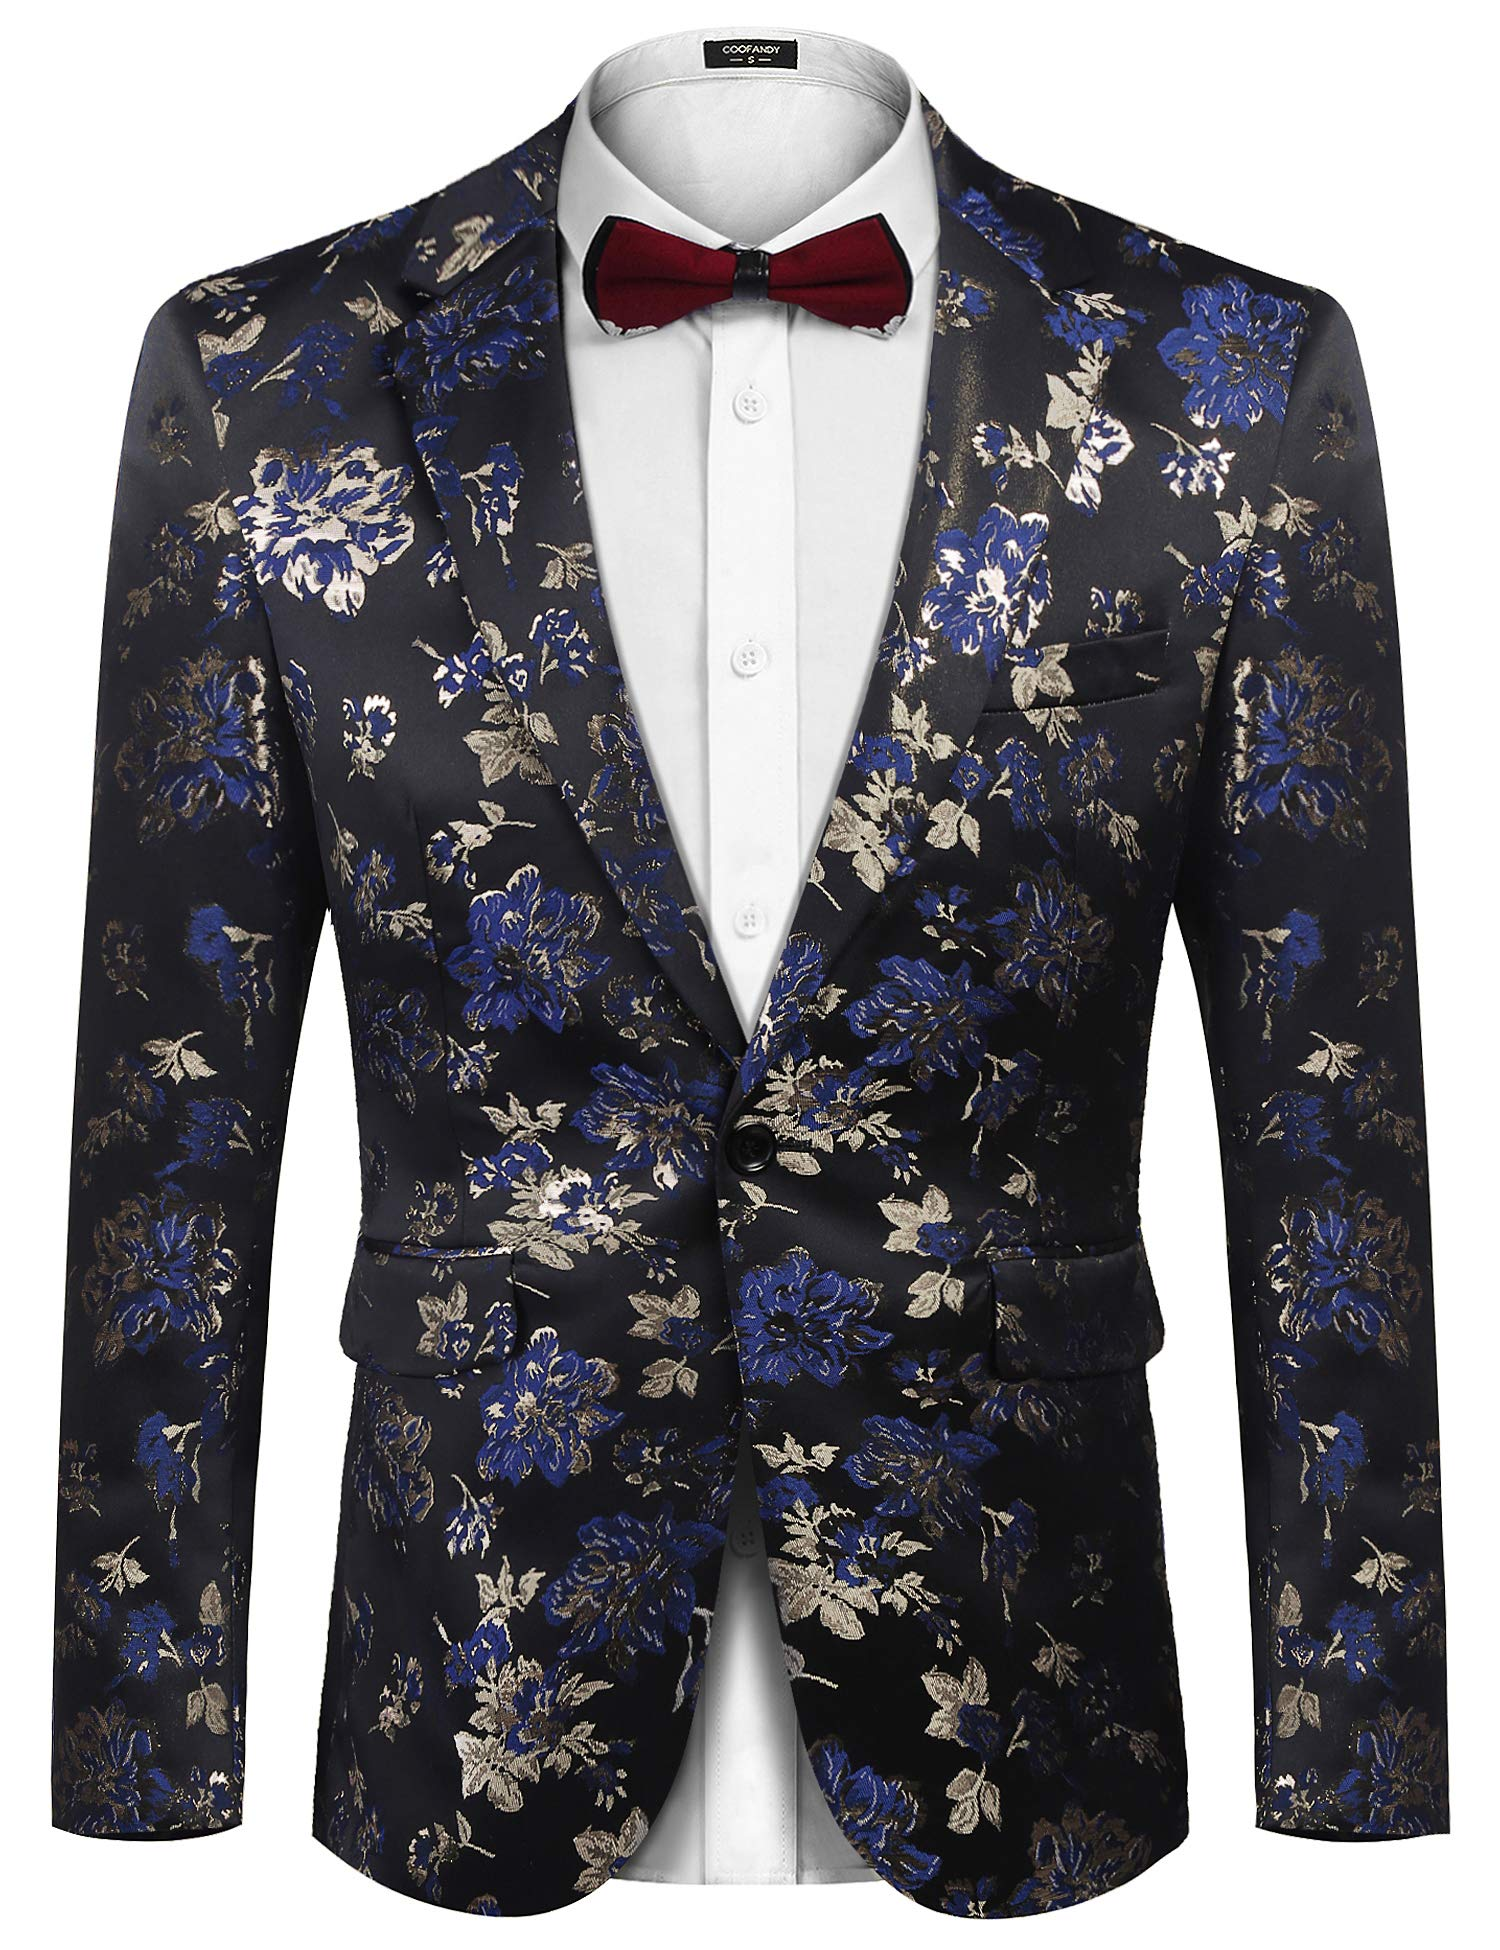 COOFANDY Men's Floral Blazer Slim Fit Dinner Tuxedo Prom Wedding Party Suit Jacket